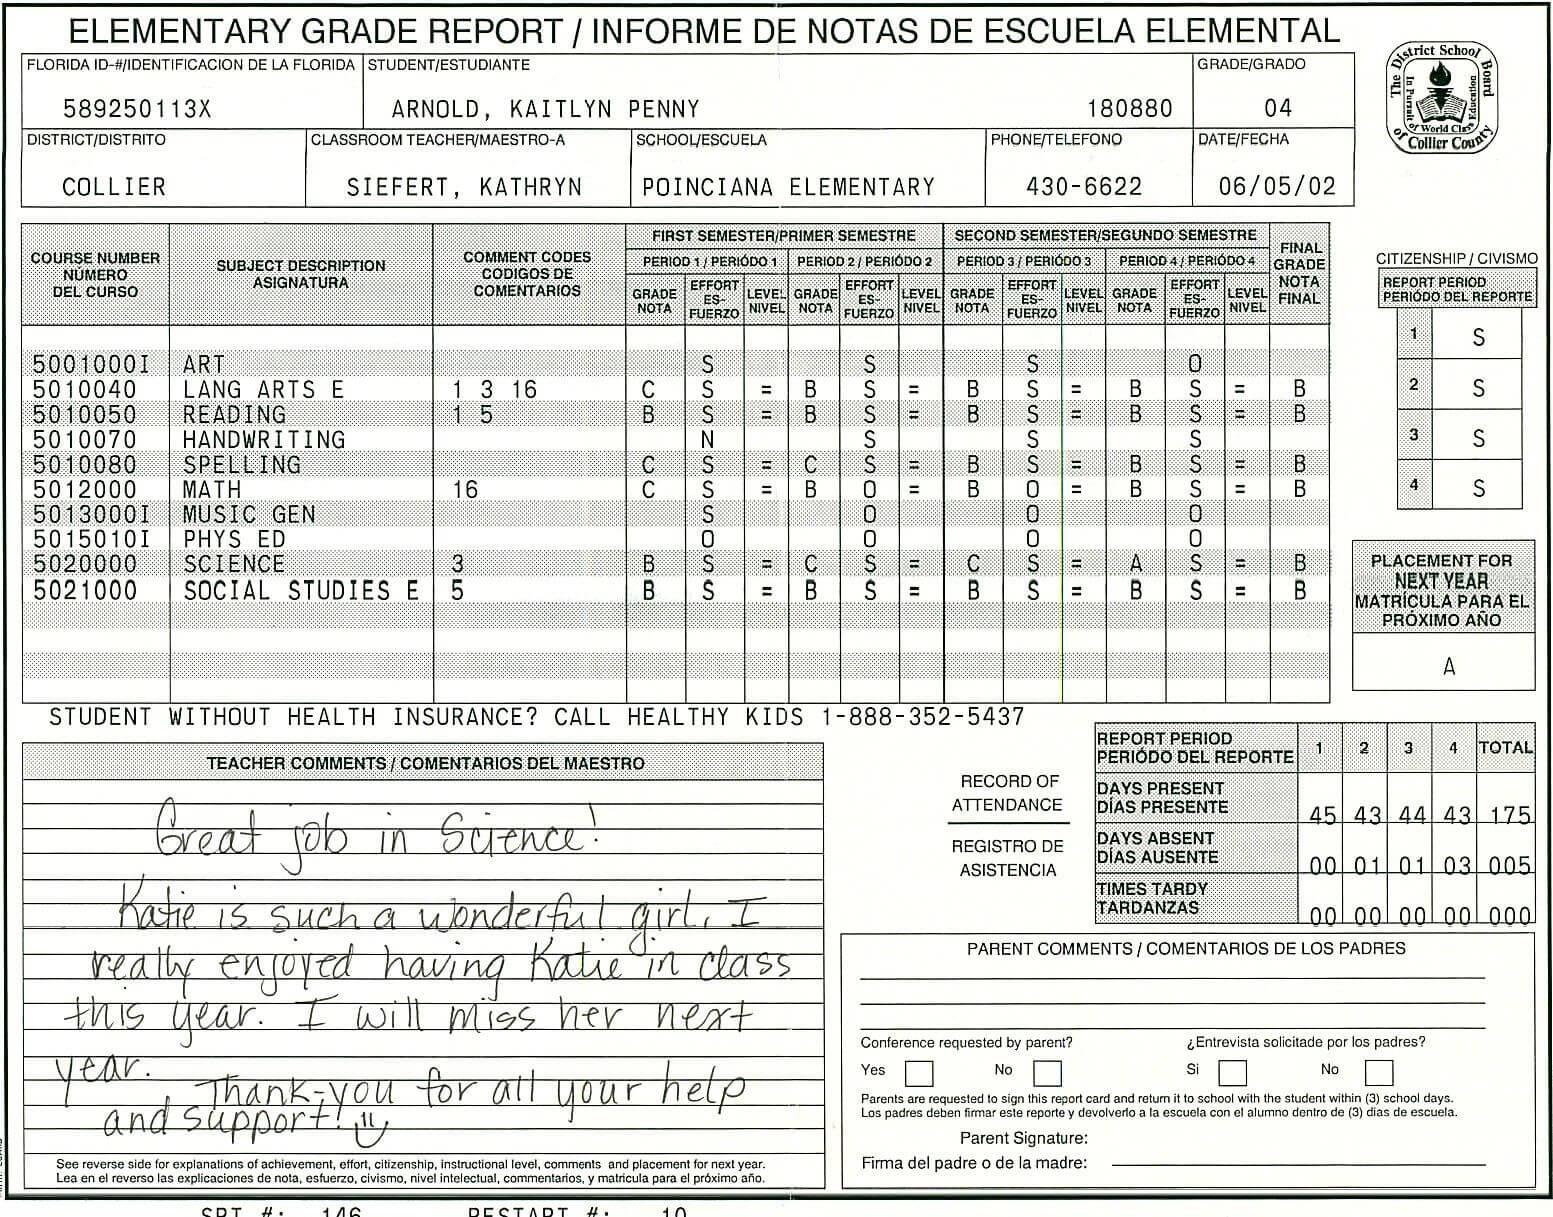 Elementary School Report Card Template | Report Card with Homeschool Report Card Template Middle School